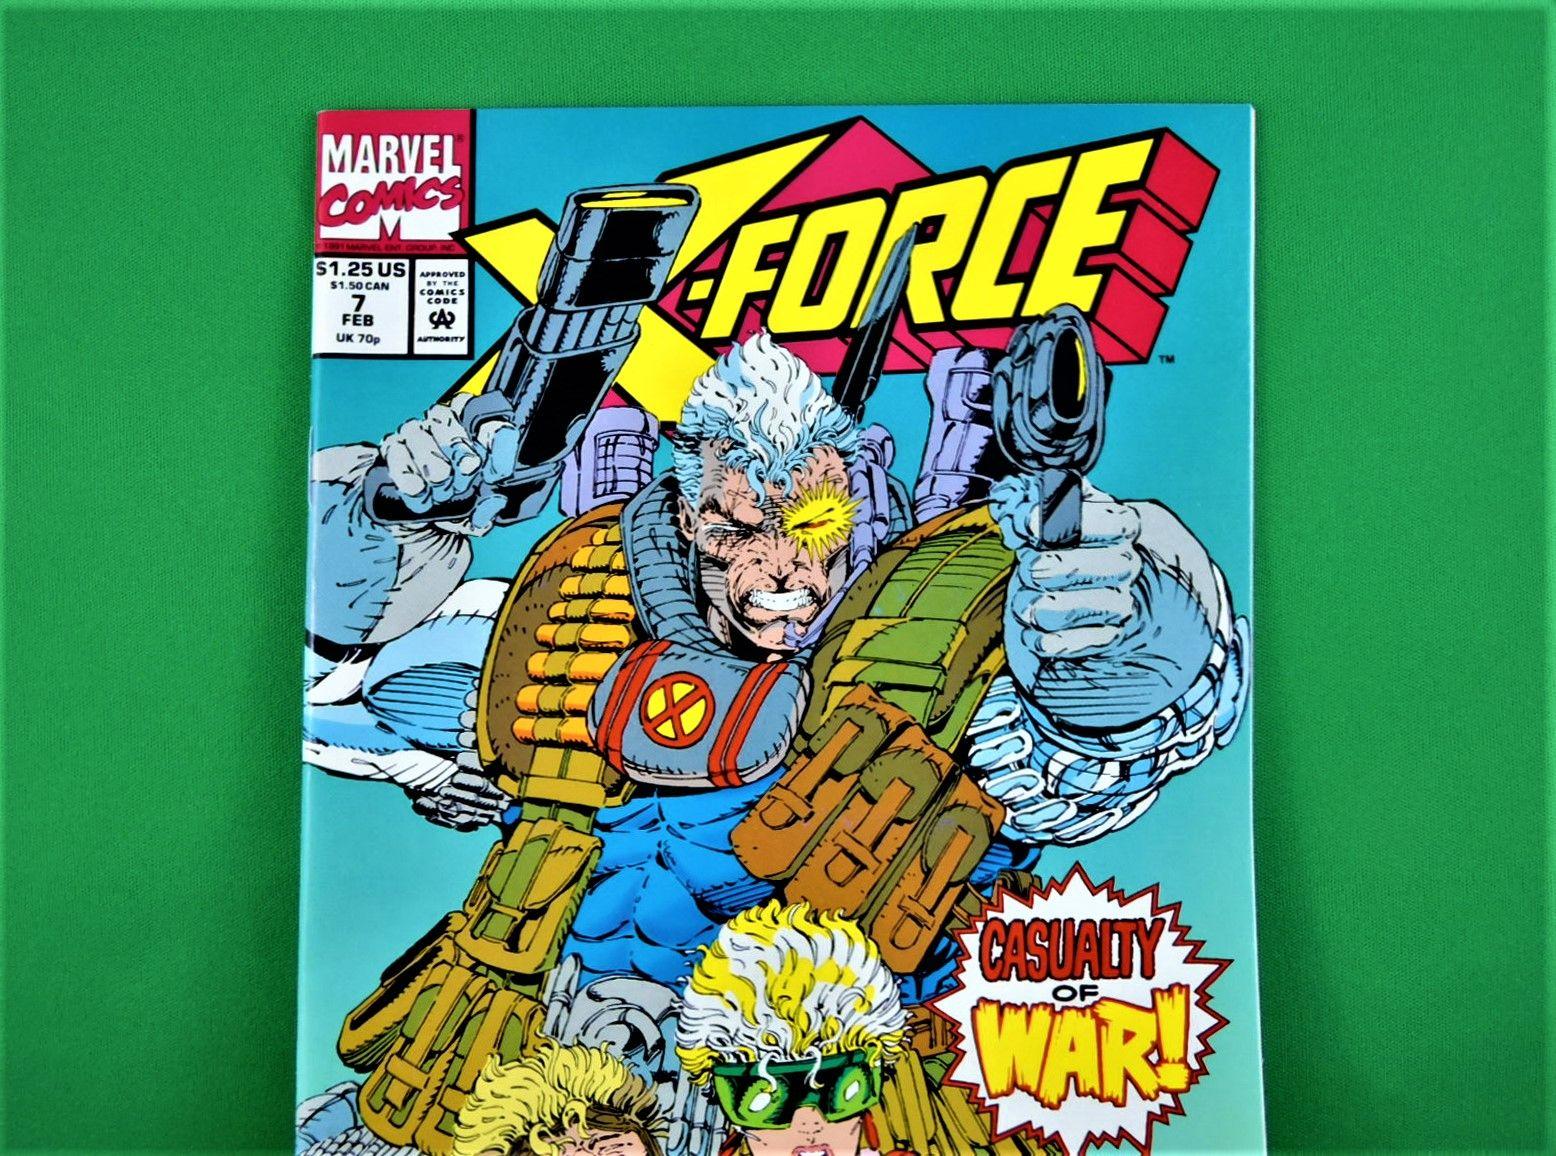 Marvel Comics X Force 7 February 1992 In 2020 Marvel Comics Marvel Comics